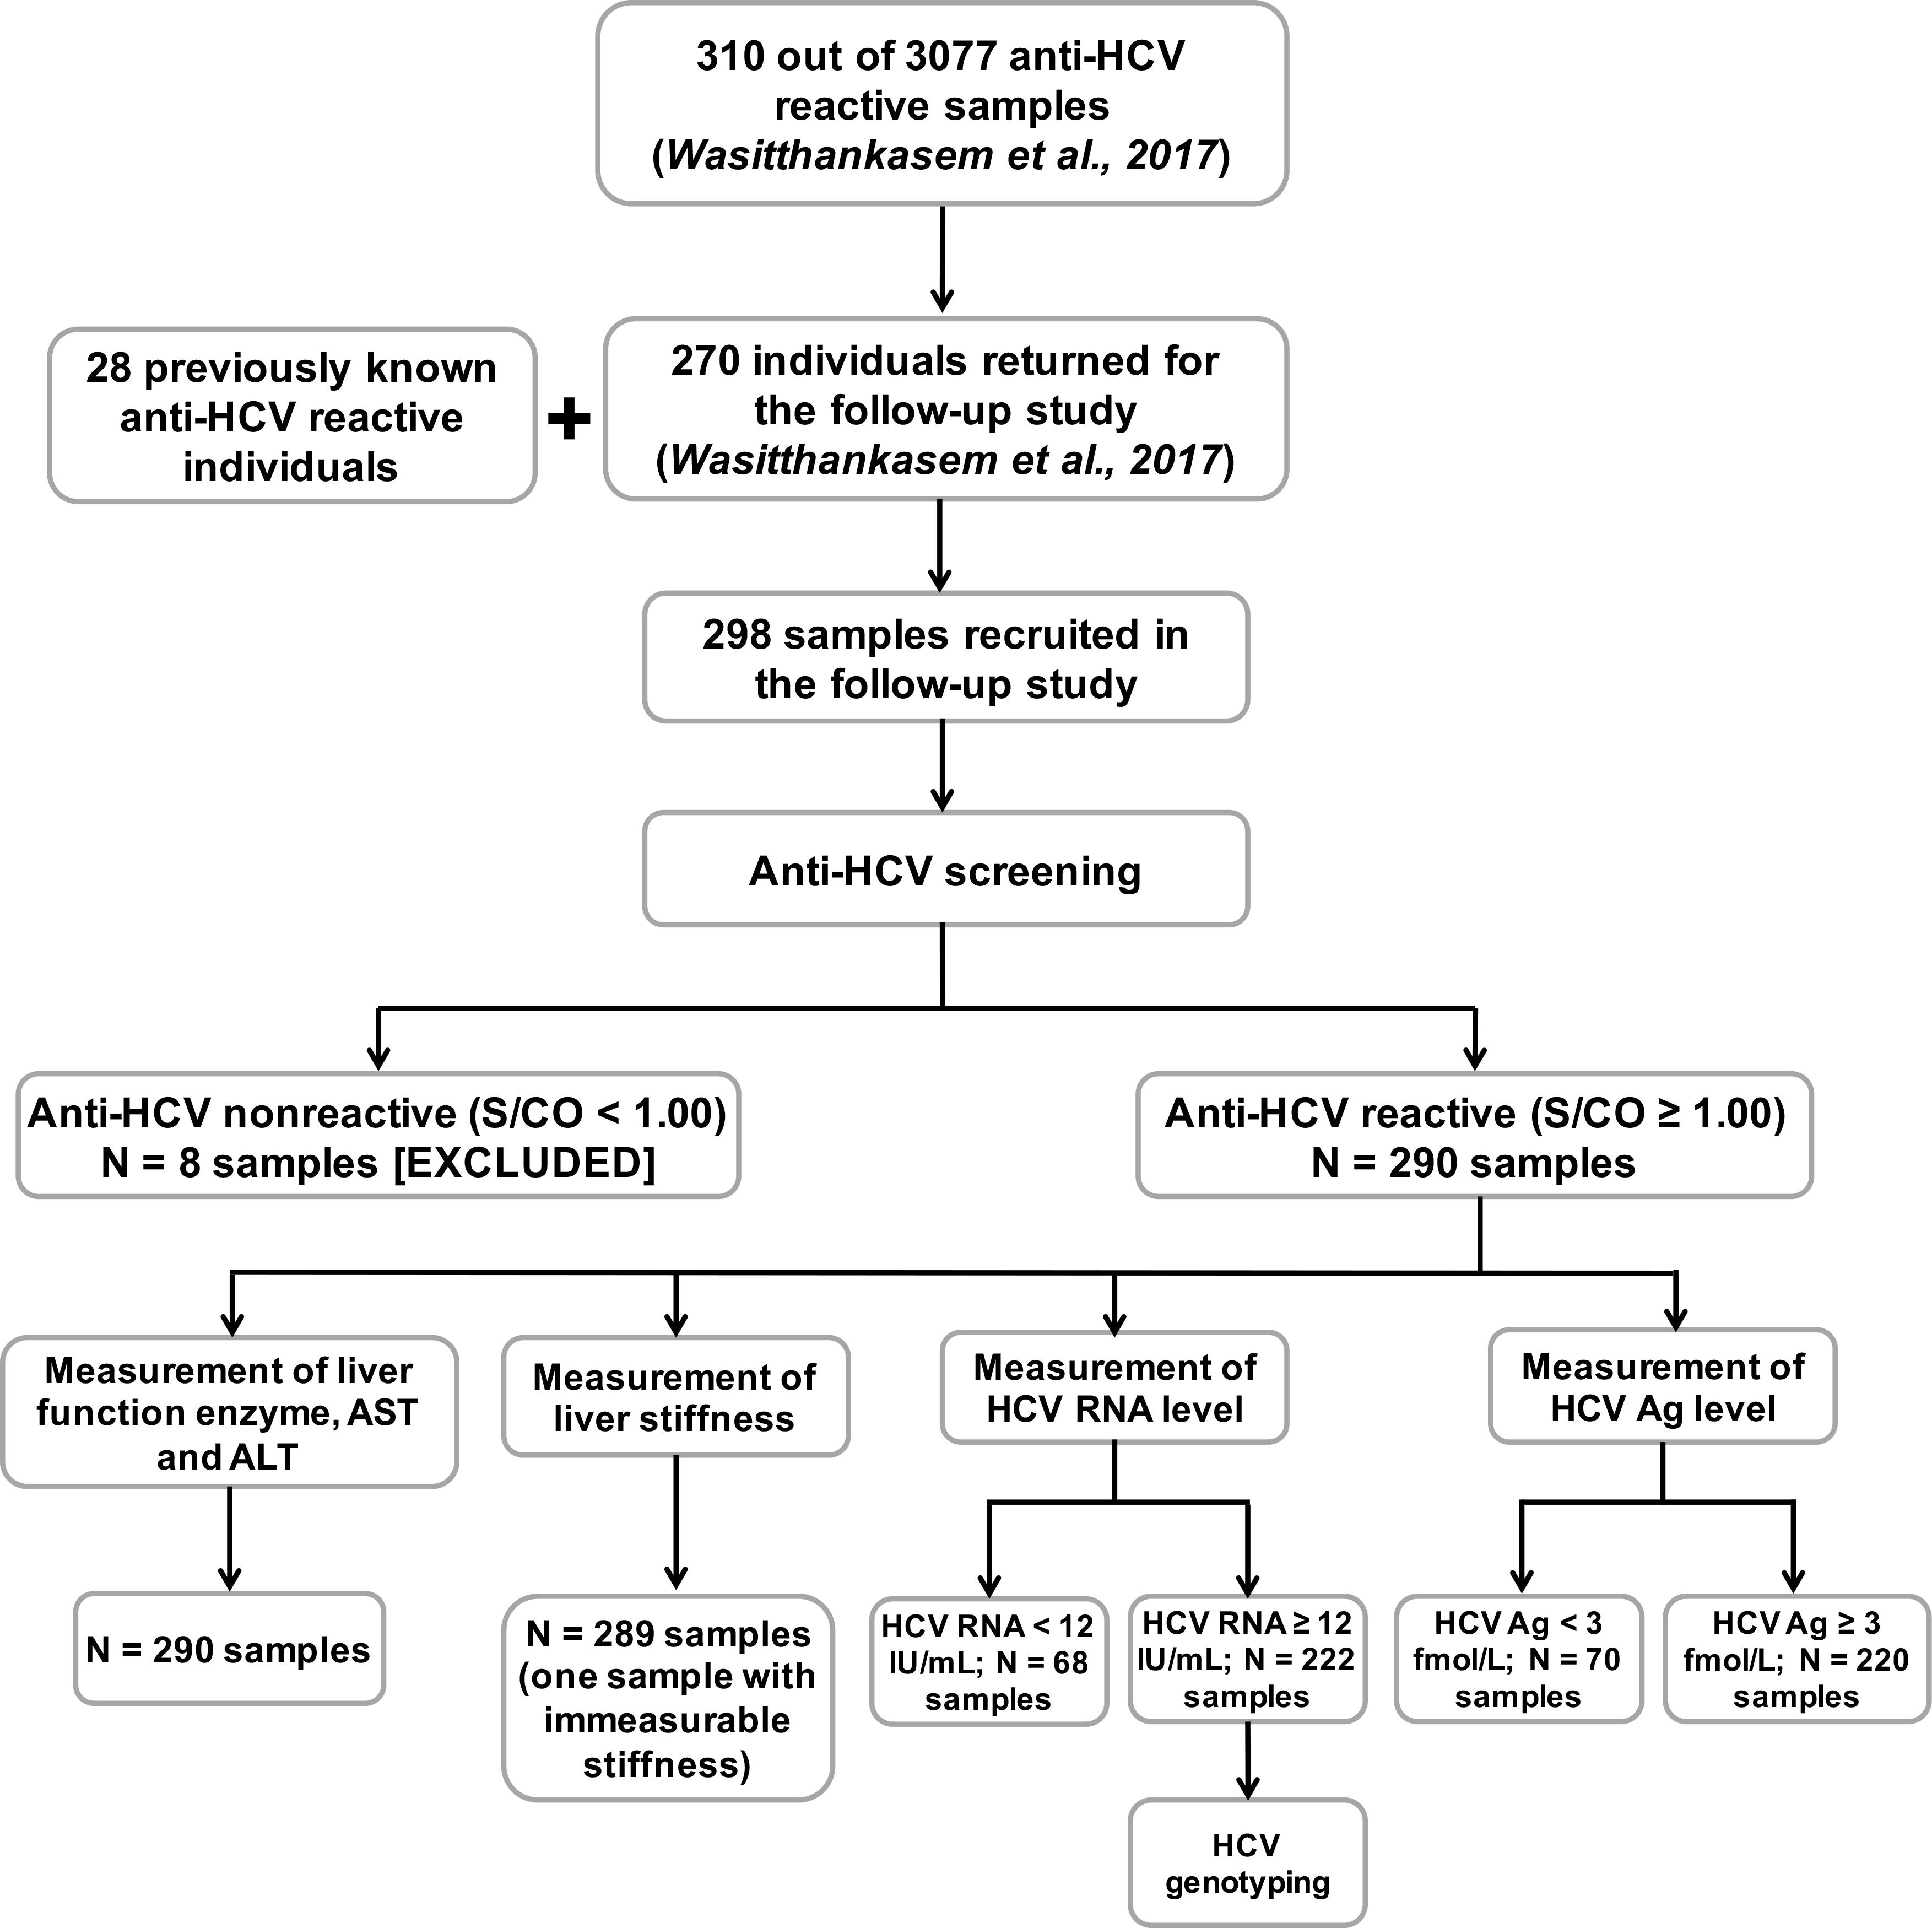 HCV core antigen is an alternative marker to HCV RNA for evaluating